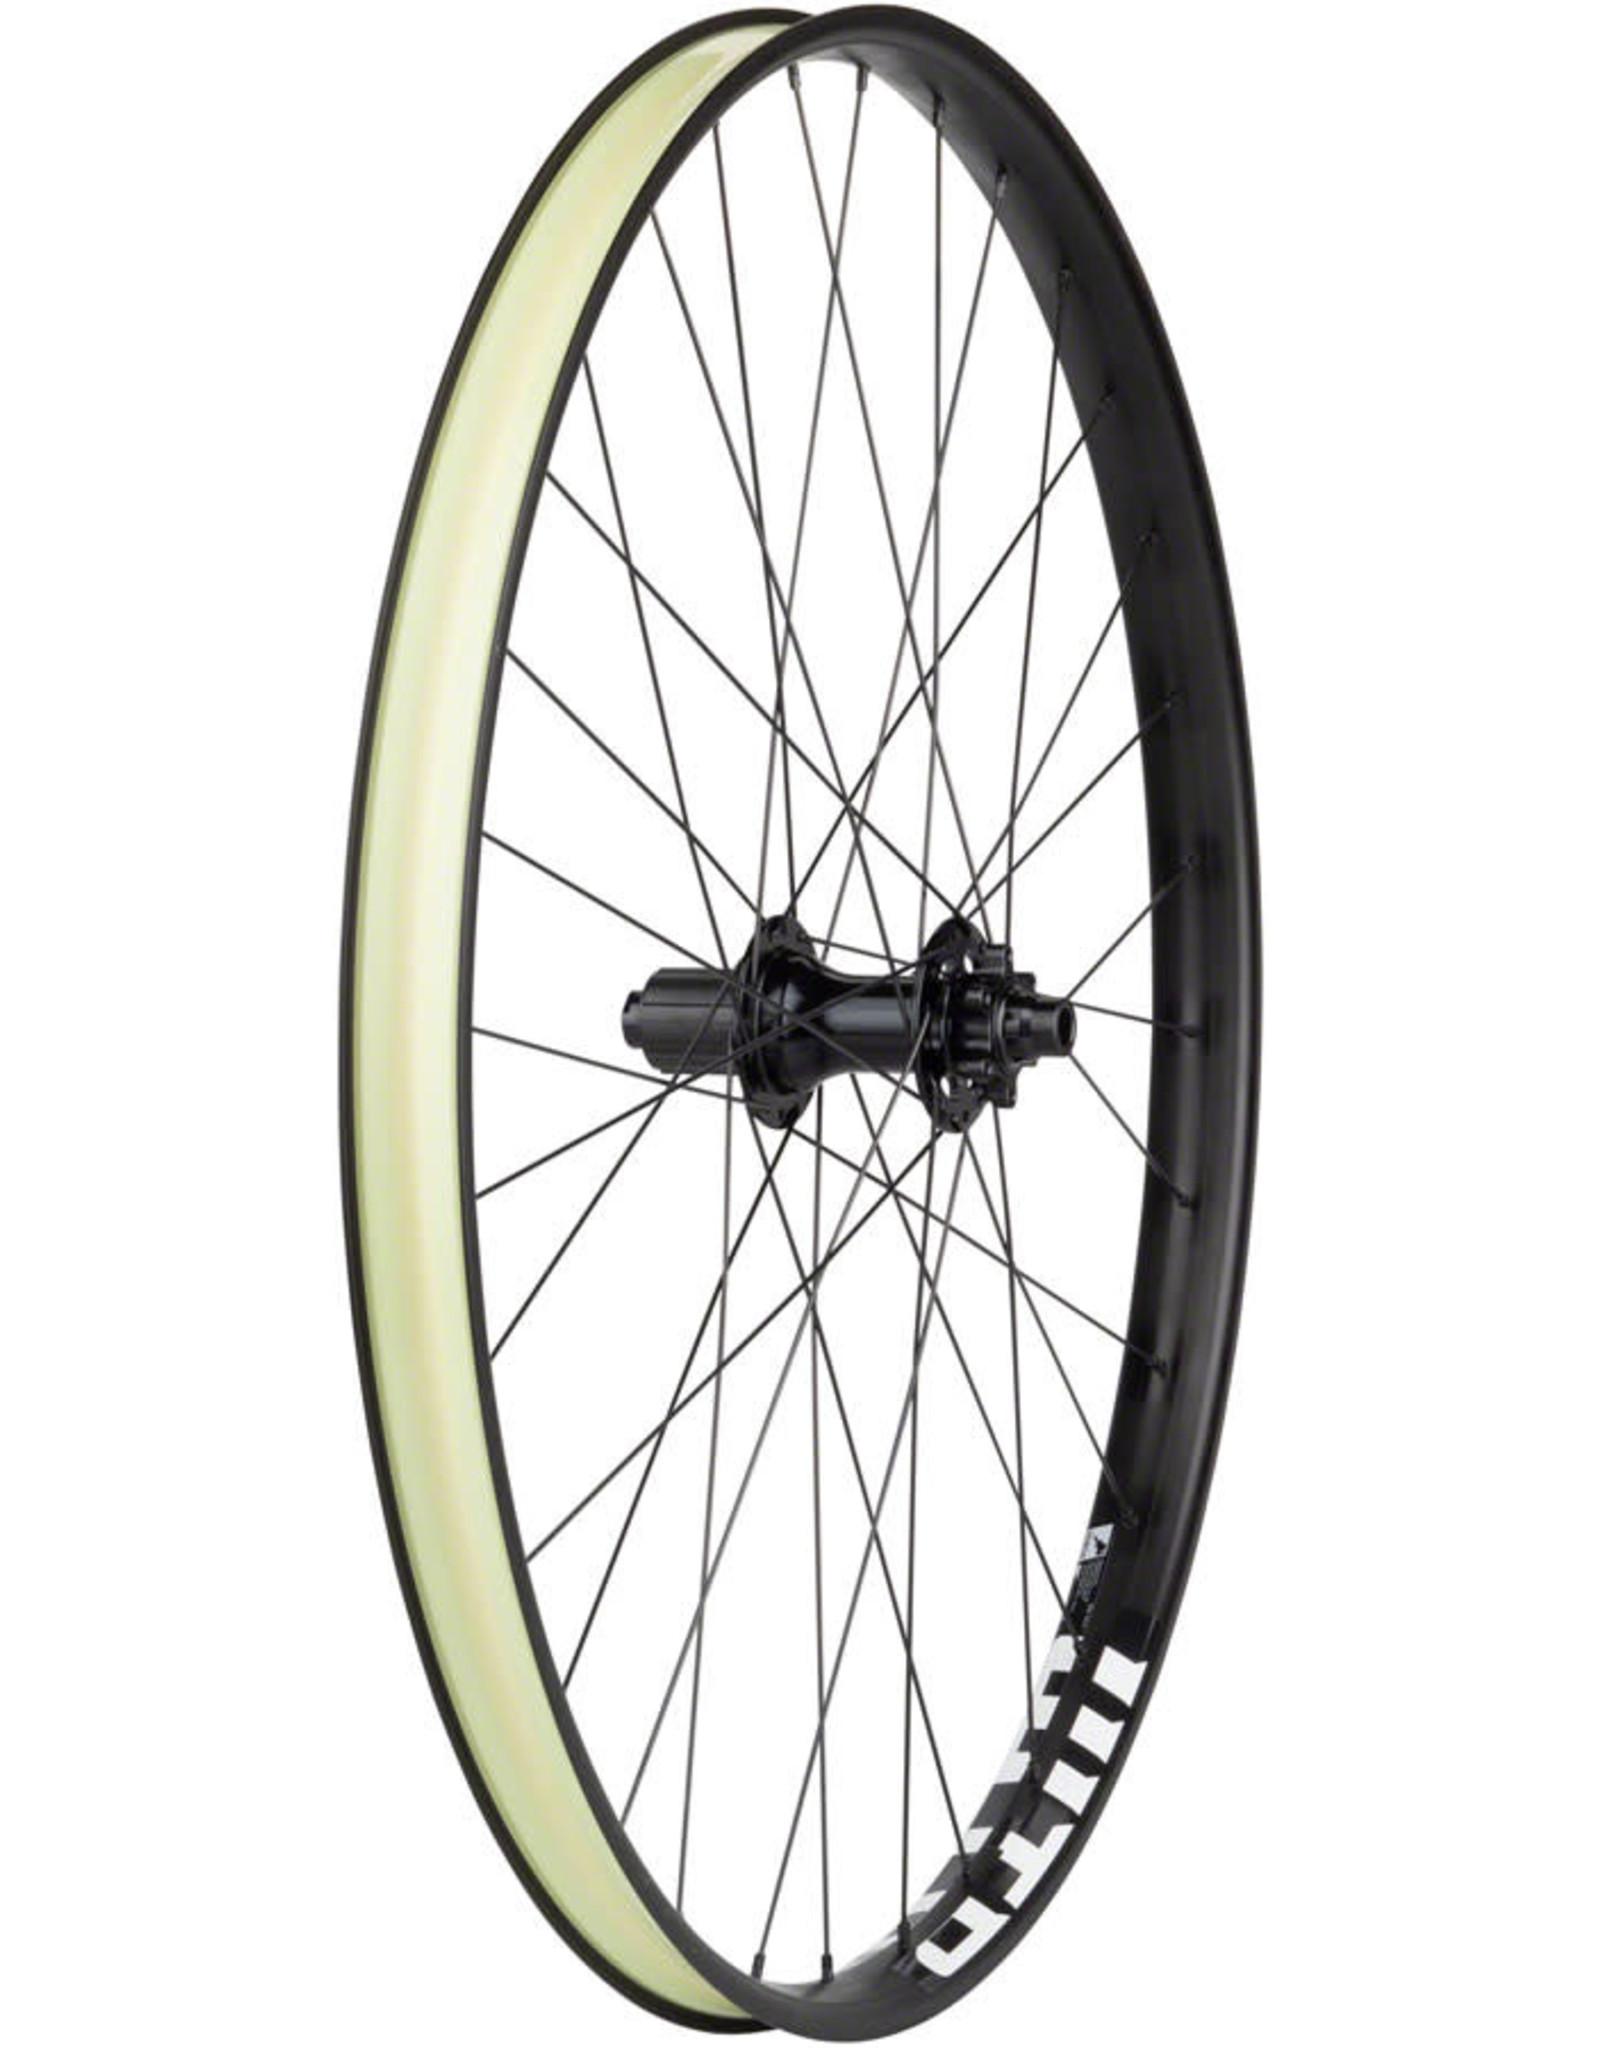 "Quality Wheels WTB i35 Disc - 29"", 12 x 148mm, 6-Bolt, HG 10, Black, Rear Wheel"